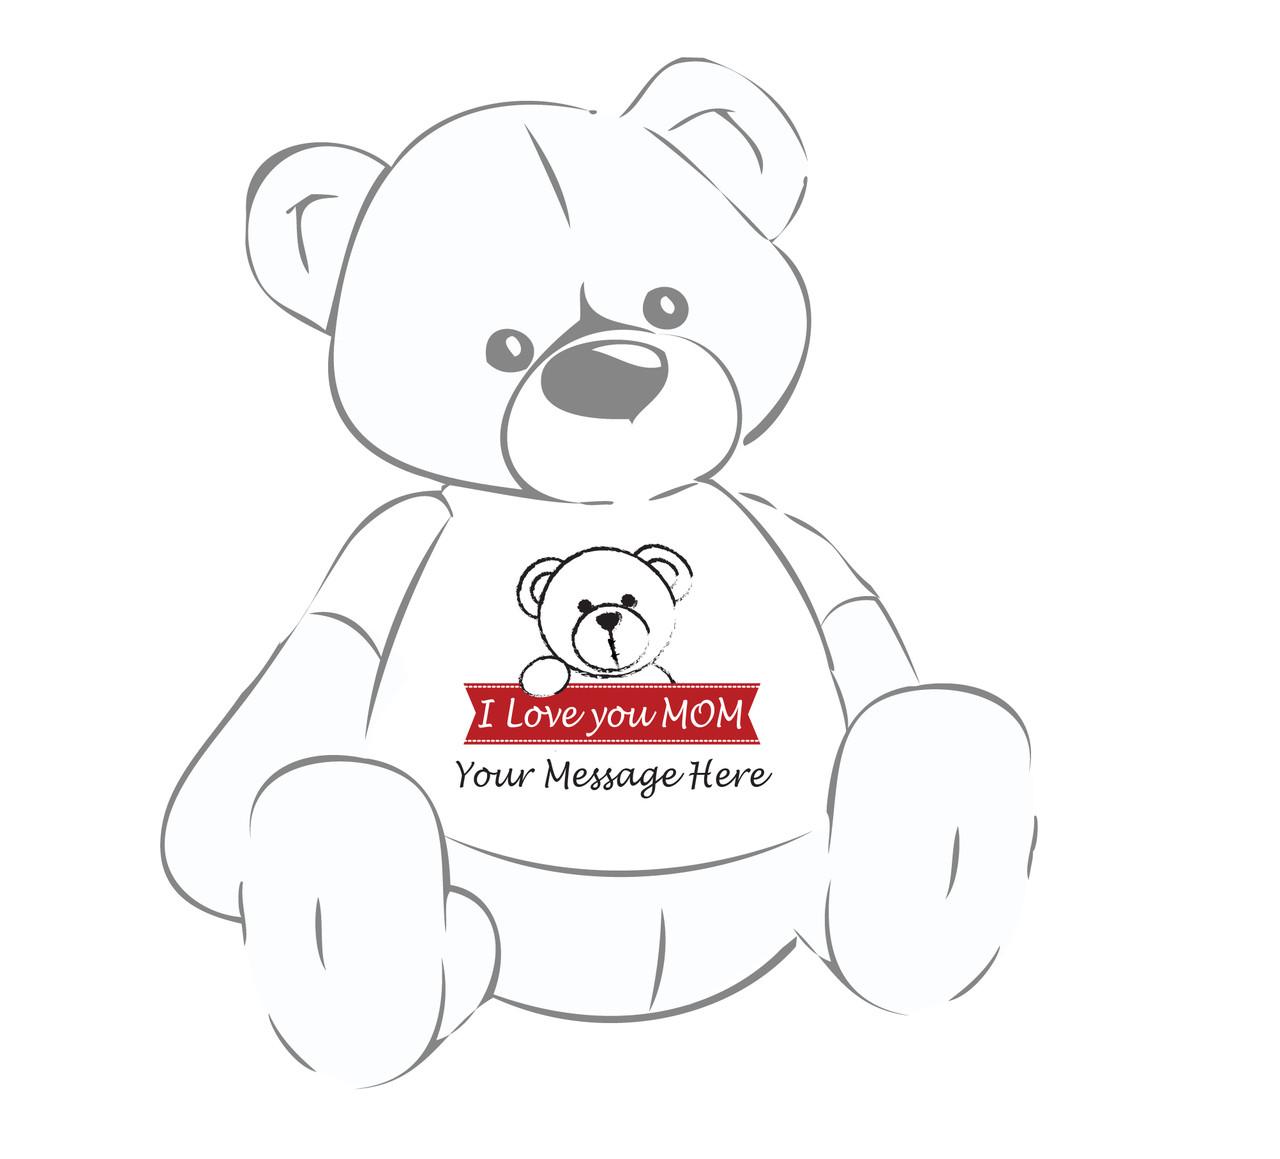 I Love you Mom Personalized Giant Teddy Bear shirt